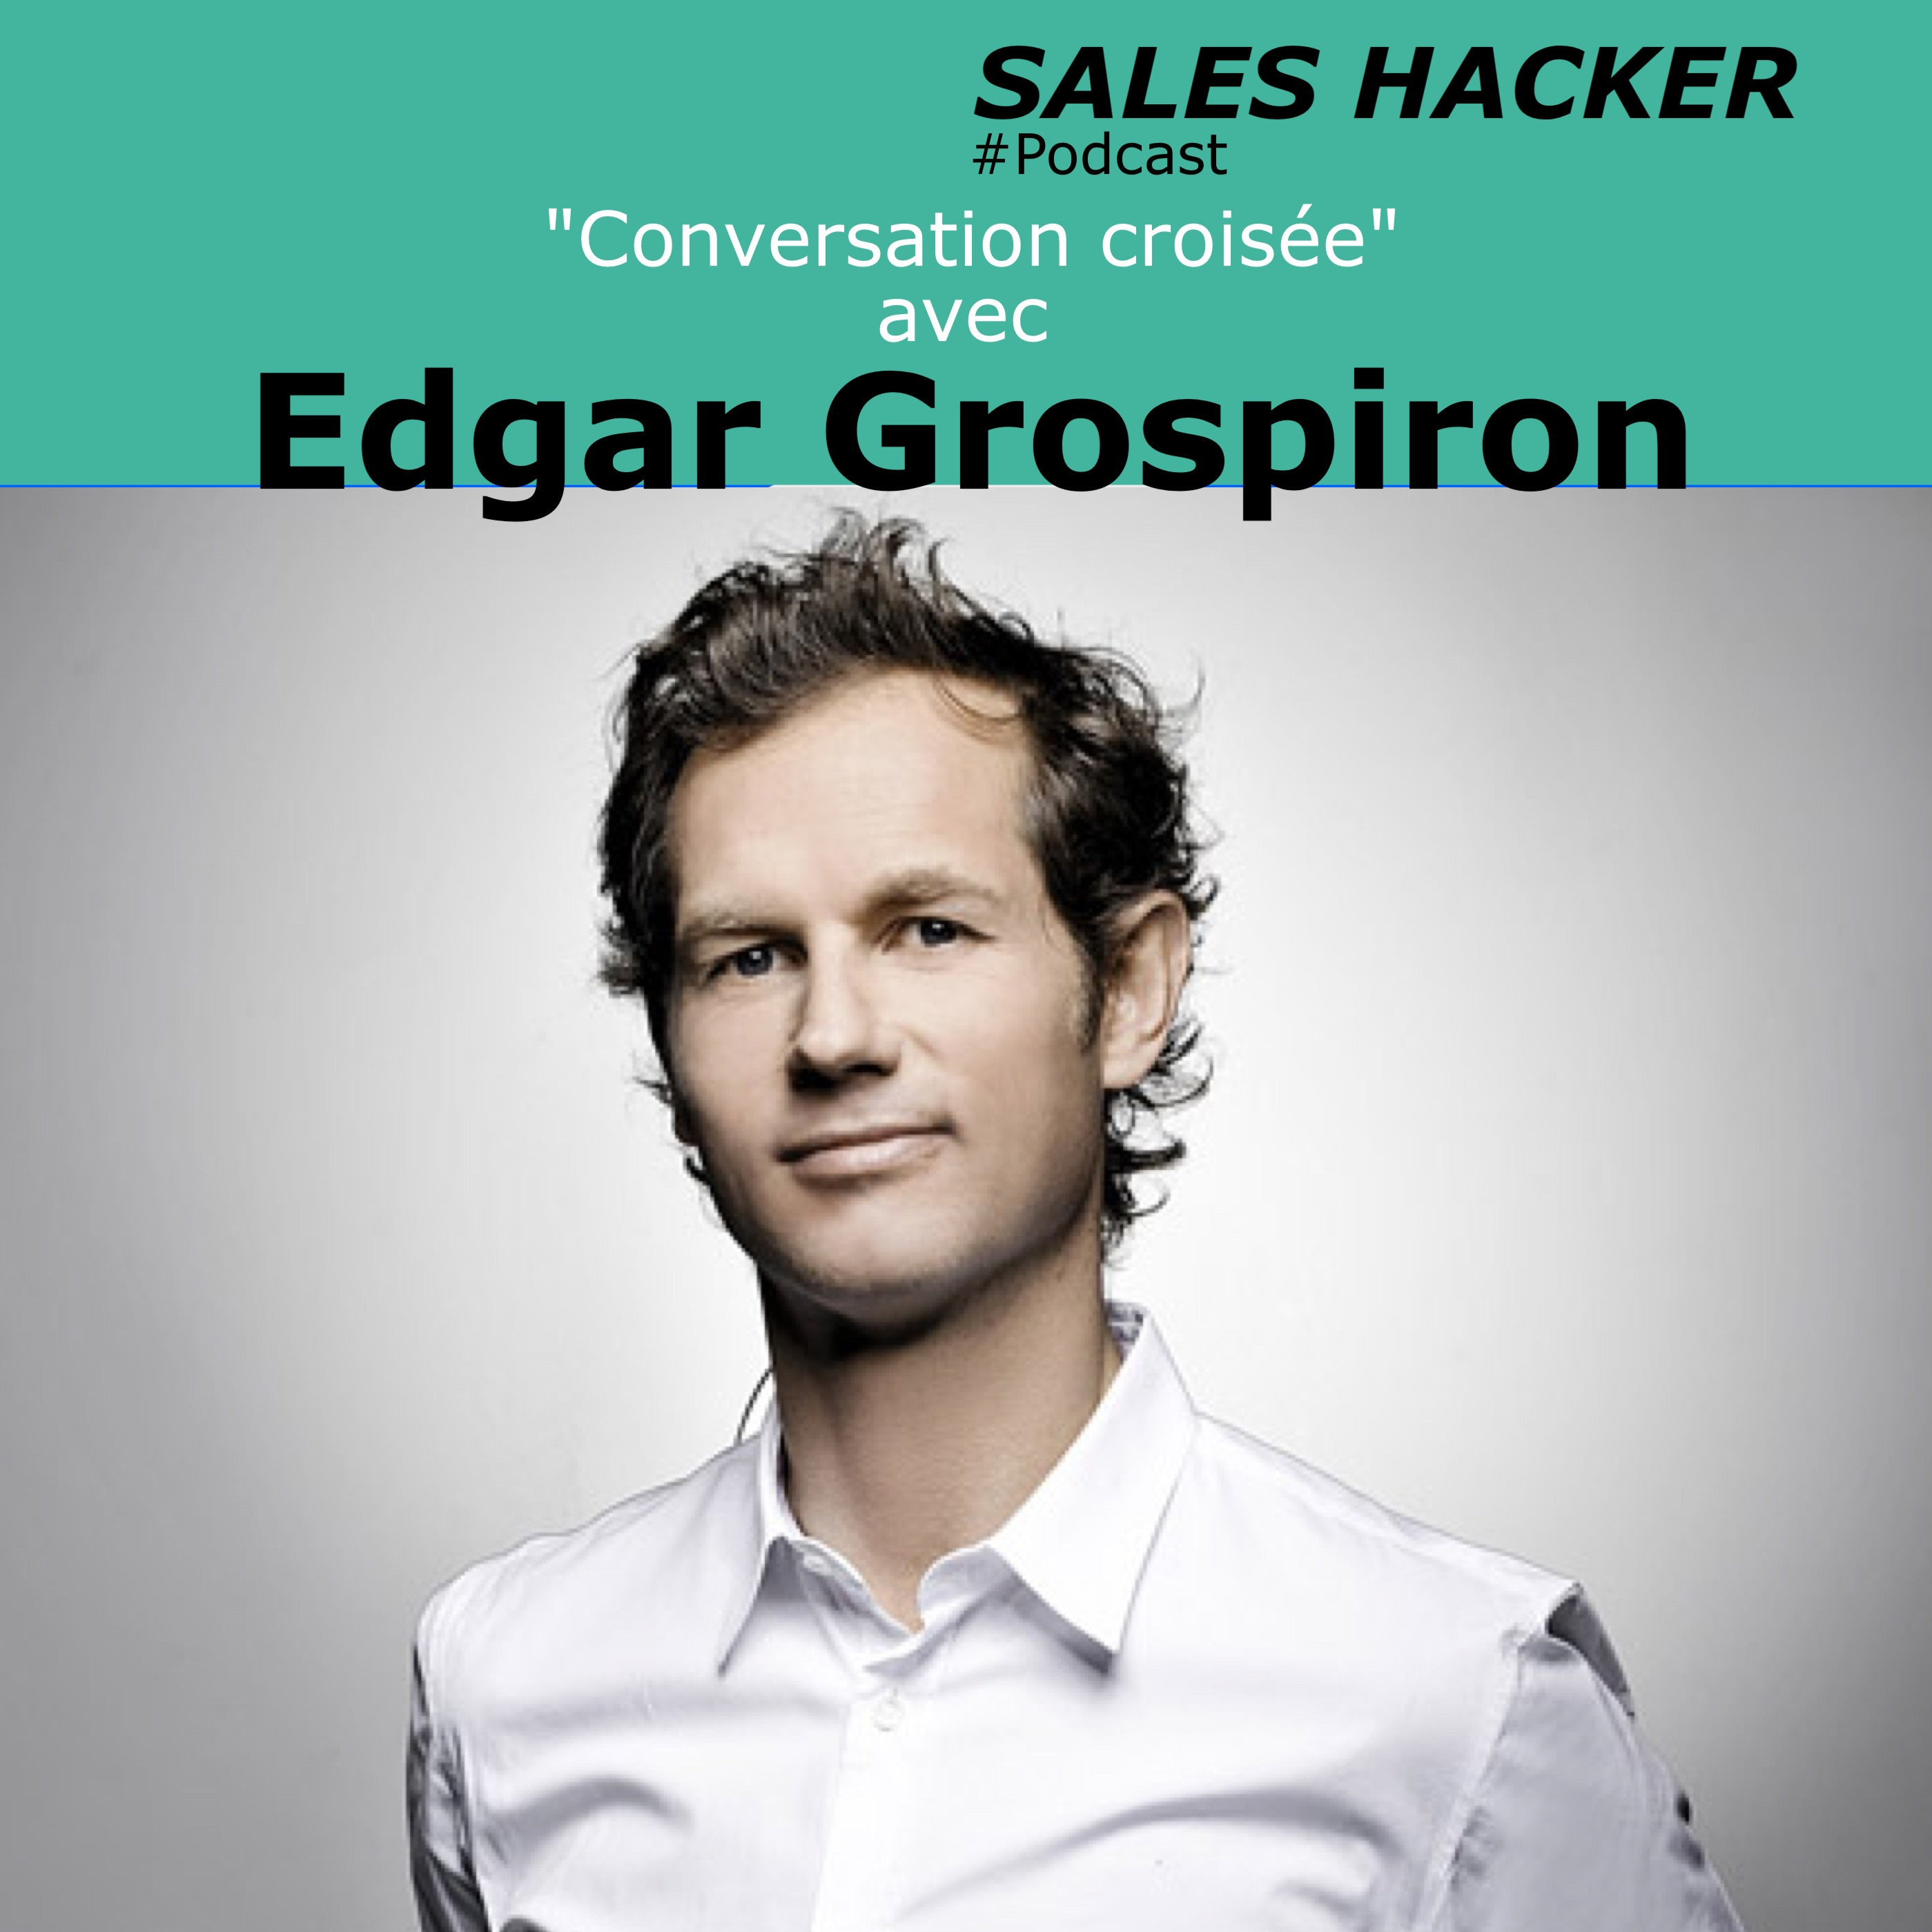 #9 - Conversation croisée - Edgar Grospiron